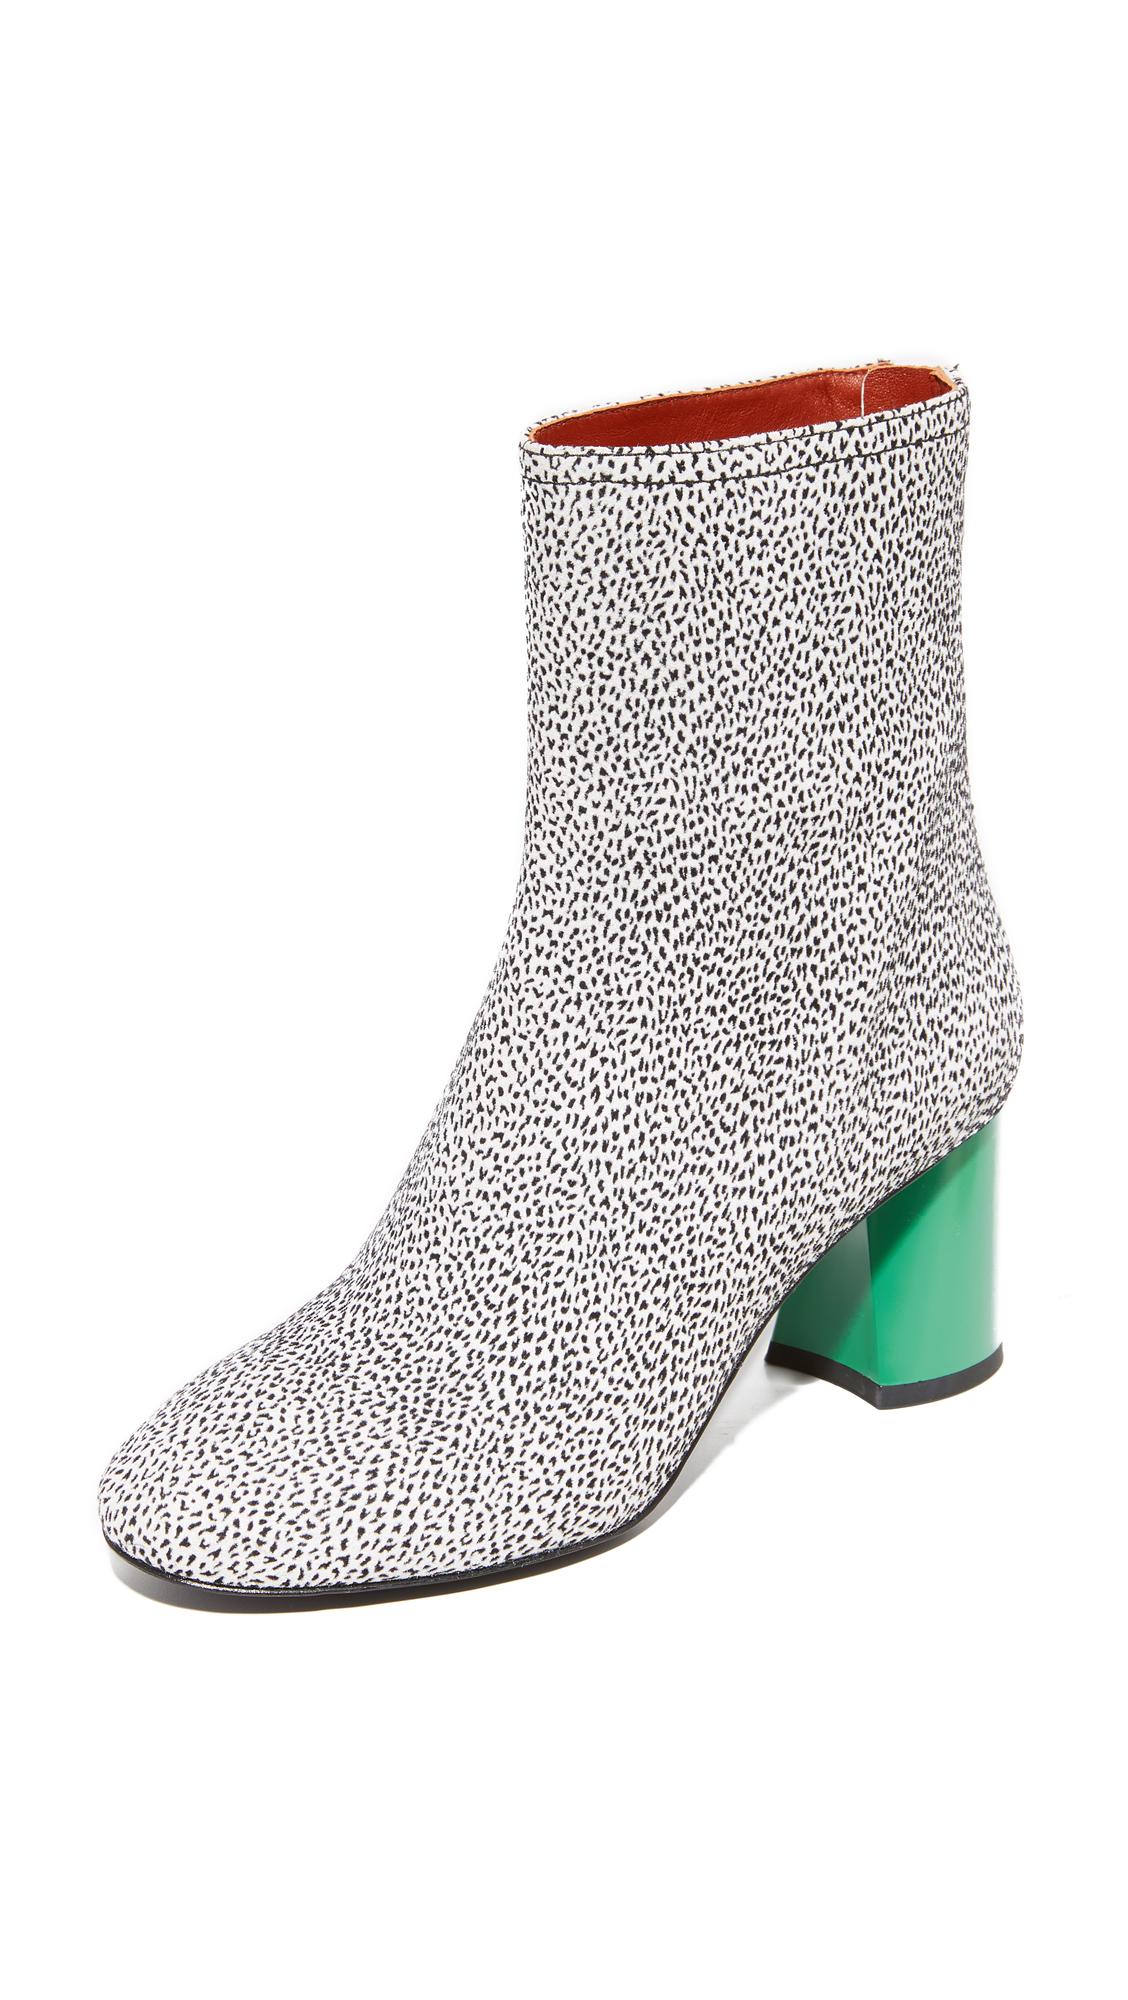 3.1 Phillip Lim Drum Contrast Heel Booties - White Cheetah